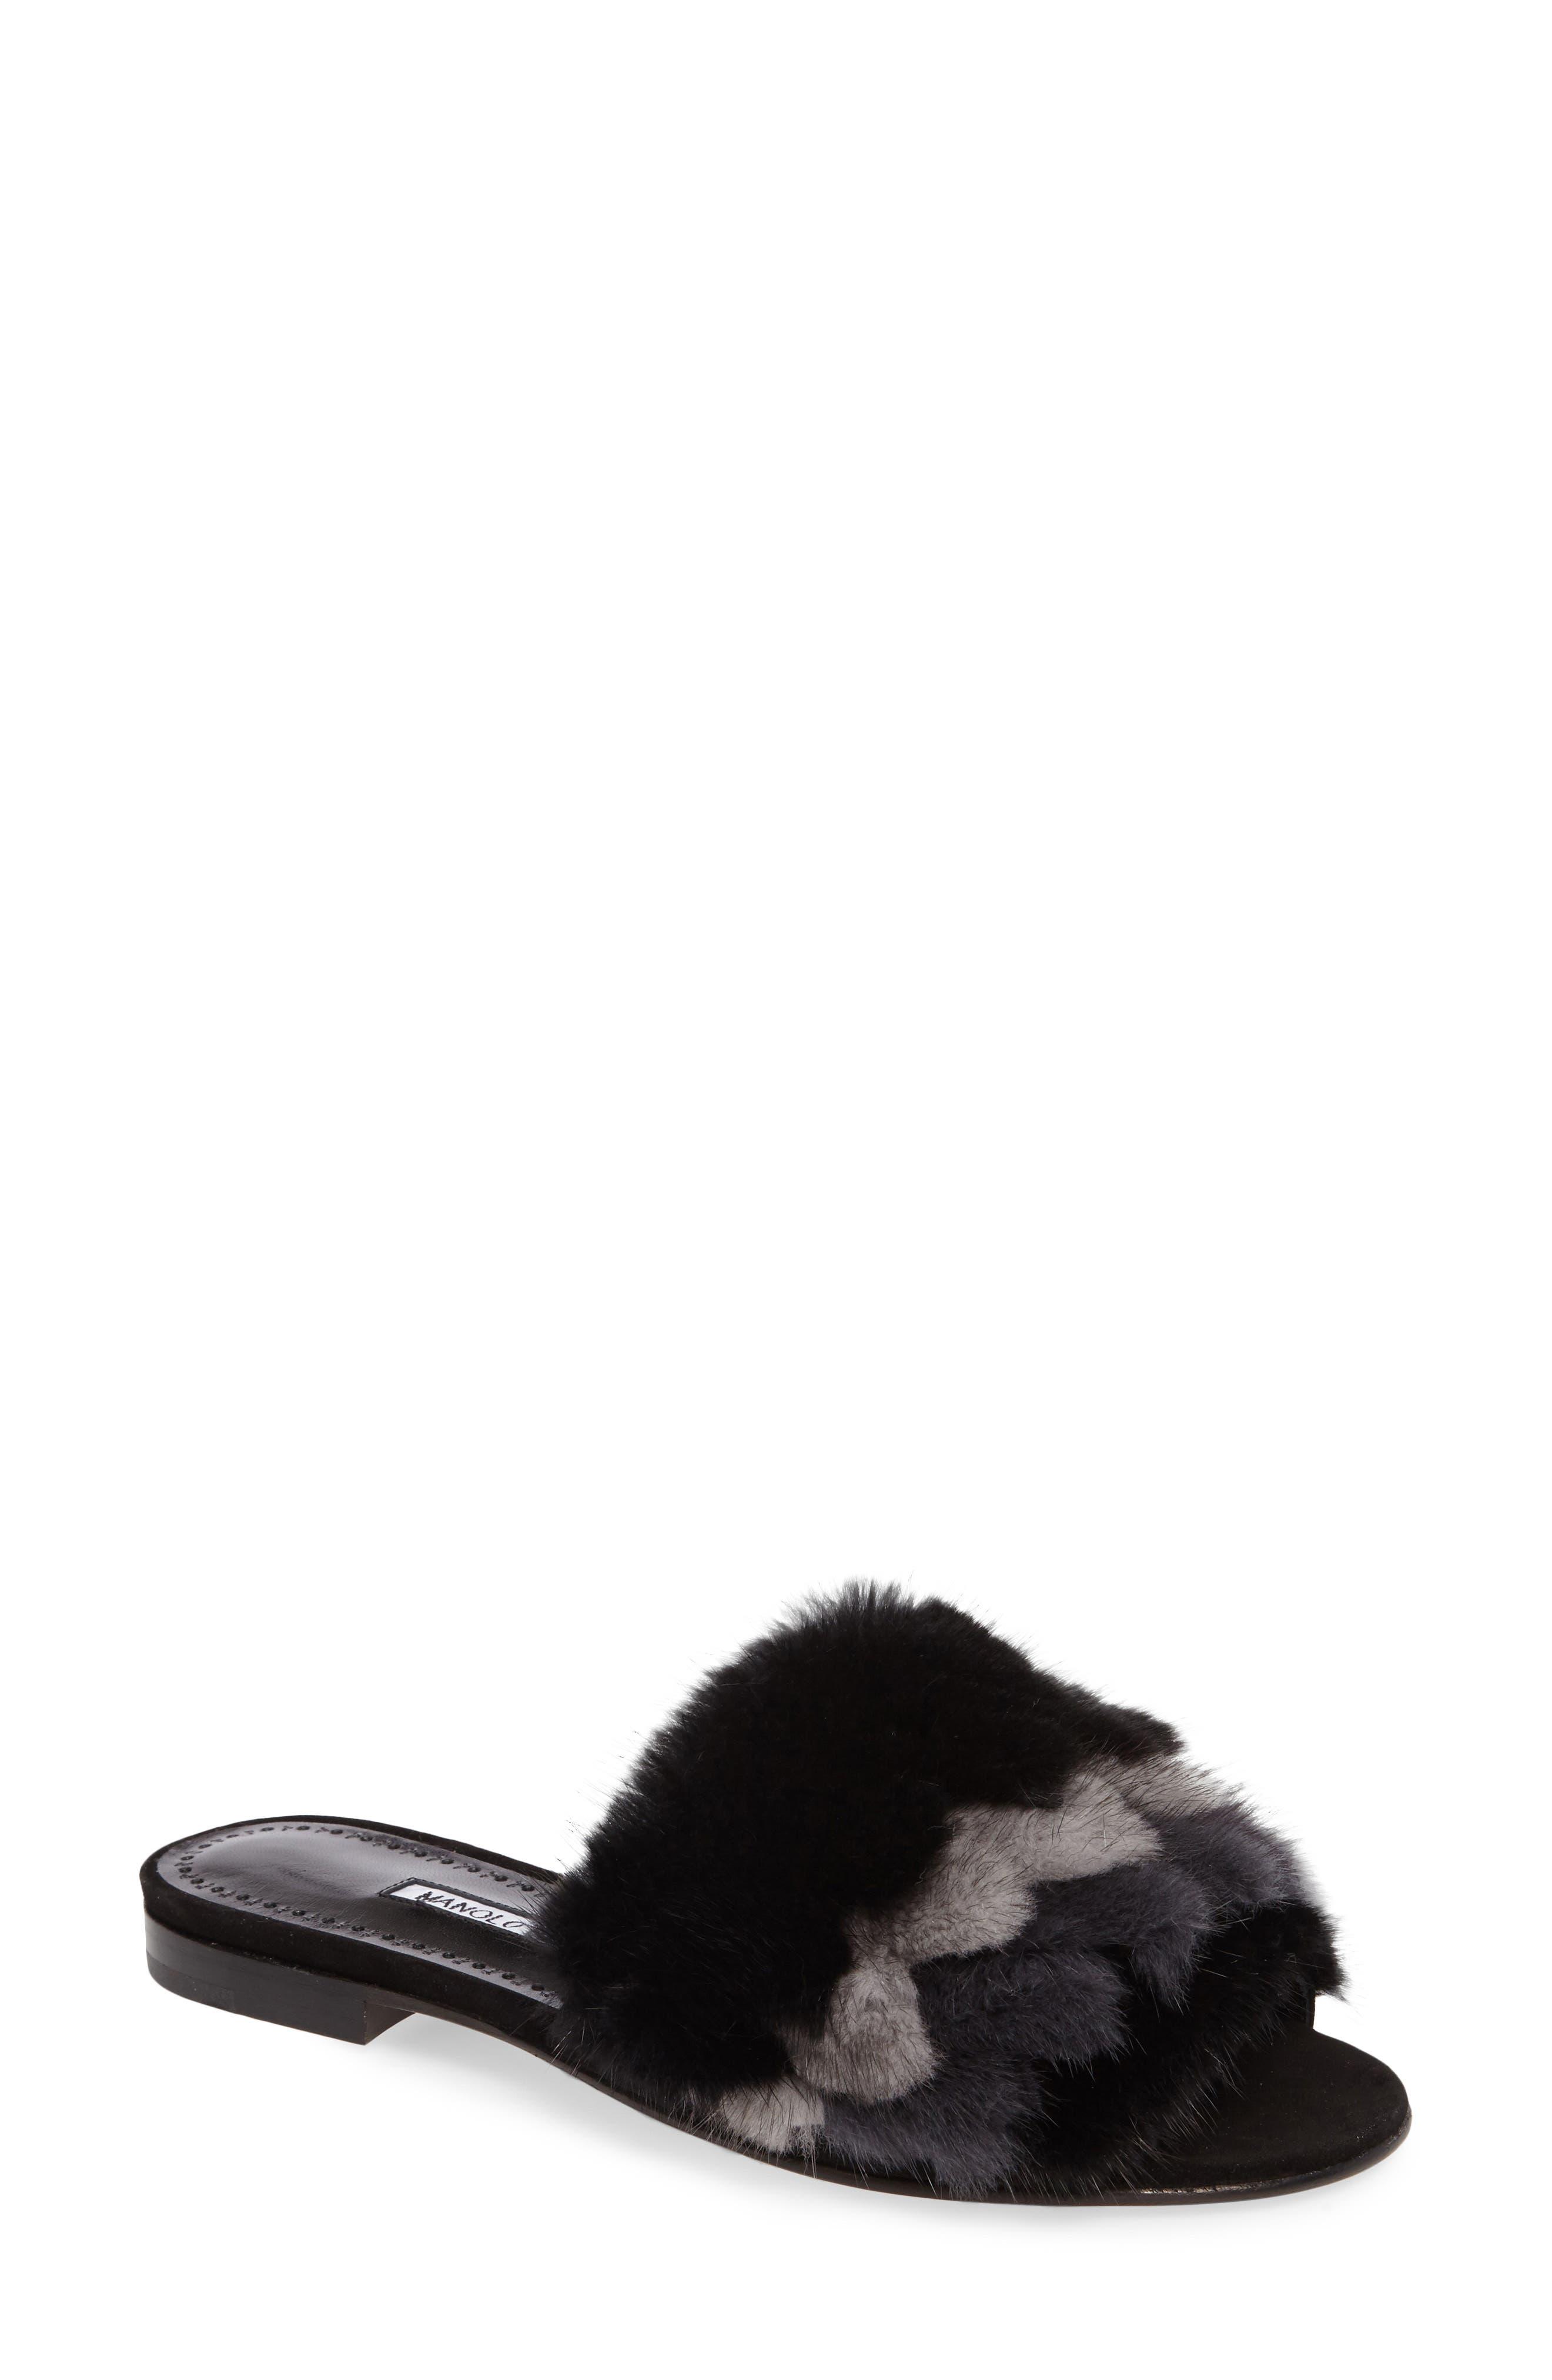 Alternate Image 1 Selected - Manolo Blahnik Pelosusmin Genuine Mink Fur Slide Sandal (Women)